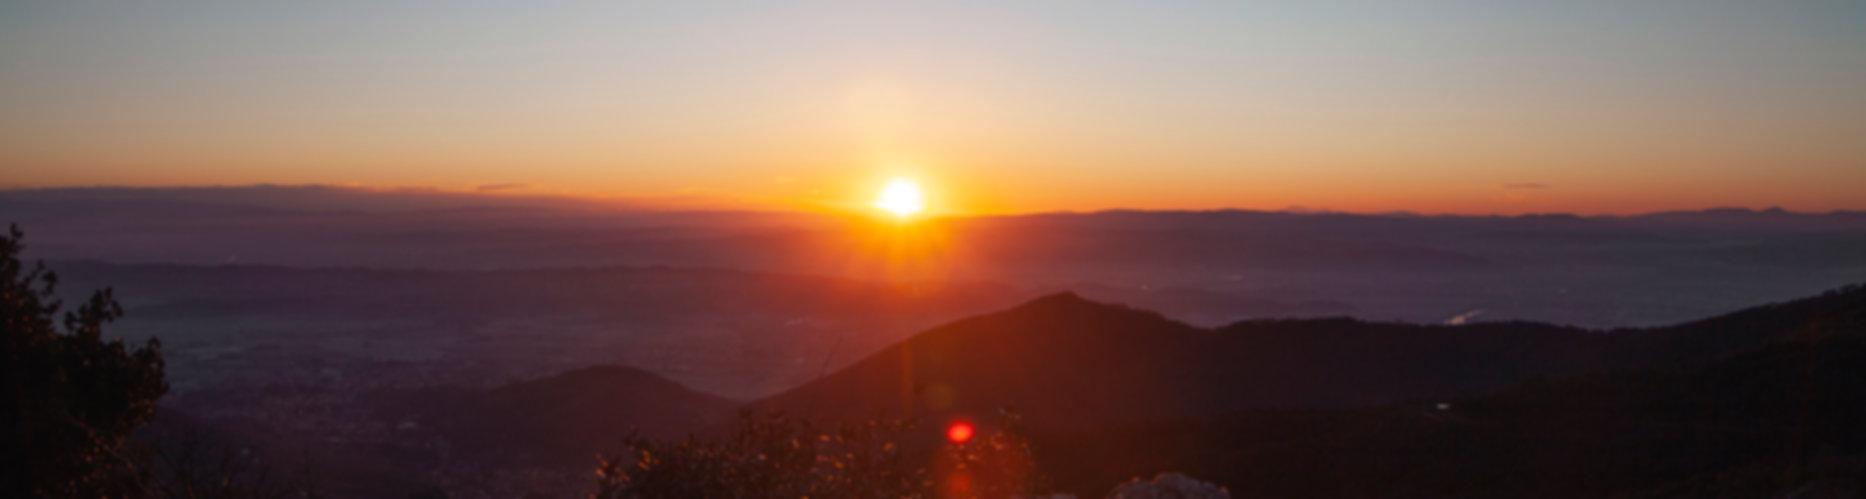 SunriseFinal2.jpg